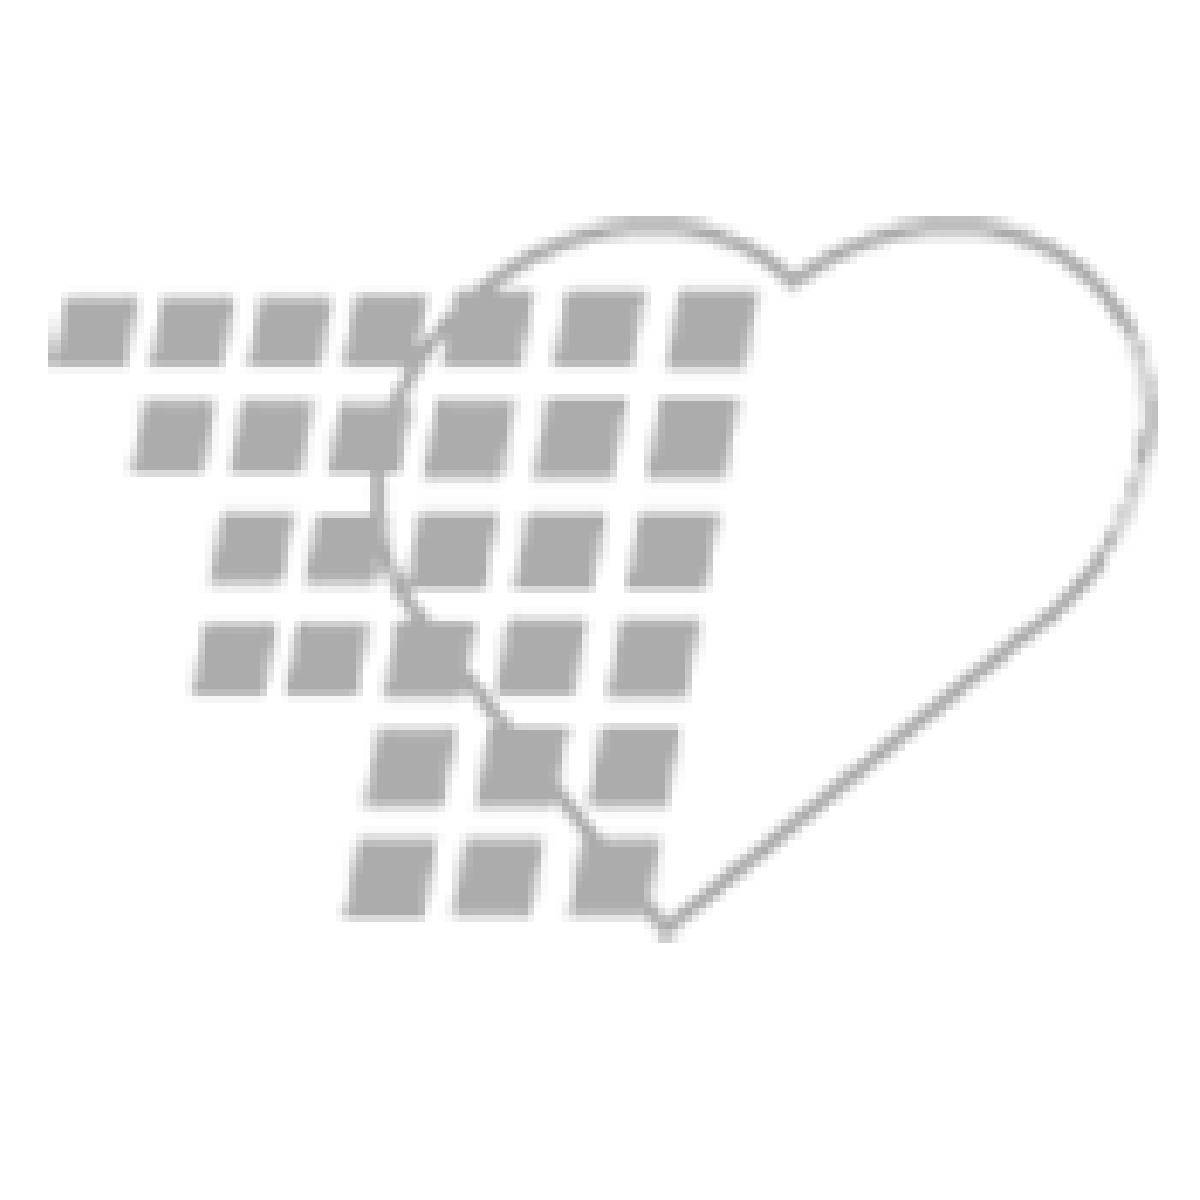 06-21-7884 BD™ Vacutainer® Plus Plastic Plasma Tube - 4 mL Draw with Green BD Hemogard™ Closure